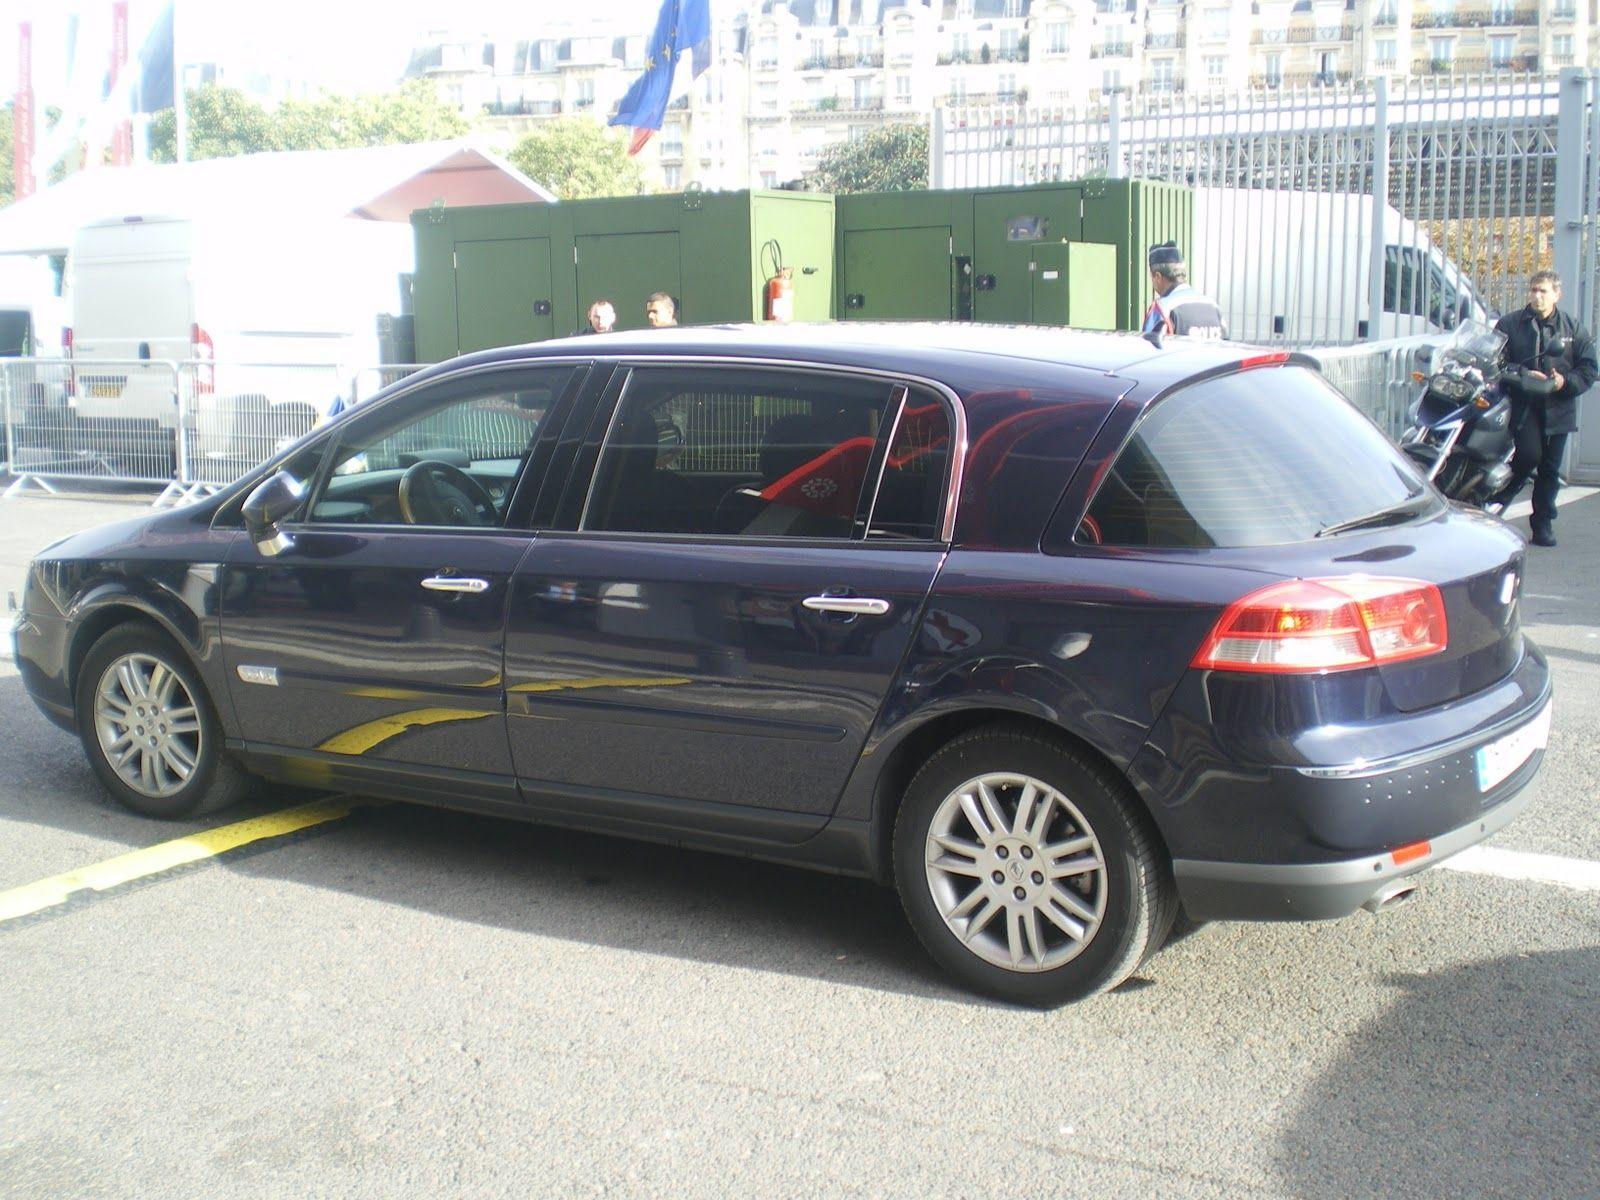 renault vel satis limousine presidentielle voitures pinterest voiture peugeot et automobile. Black Bedroom Furniture Sets. Home Design Ideas